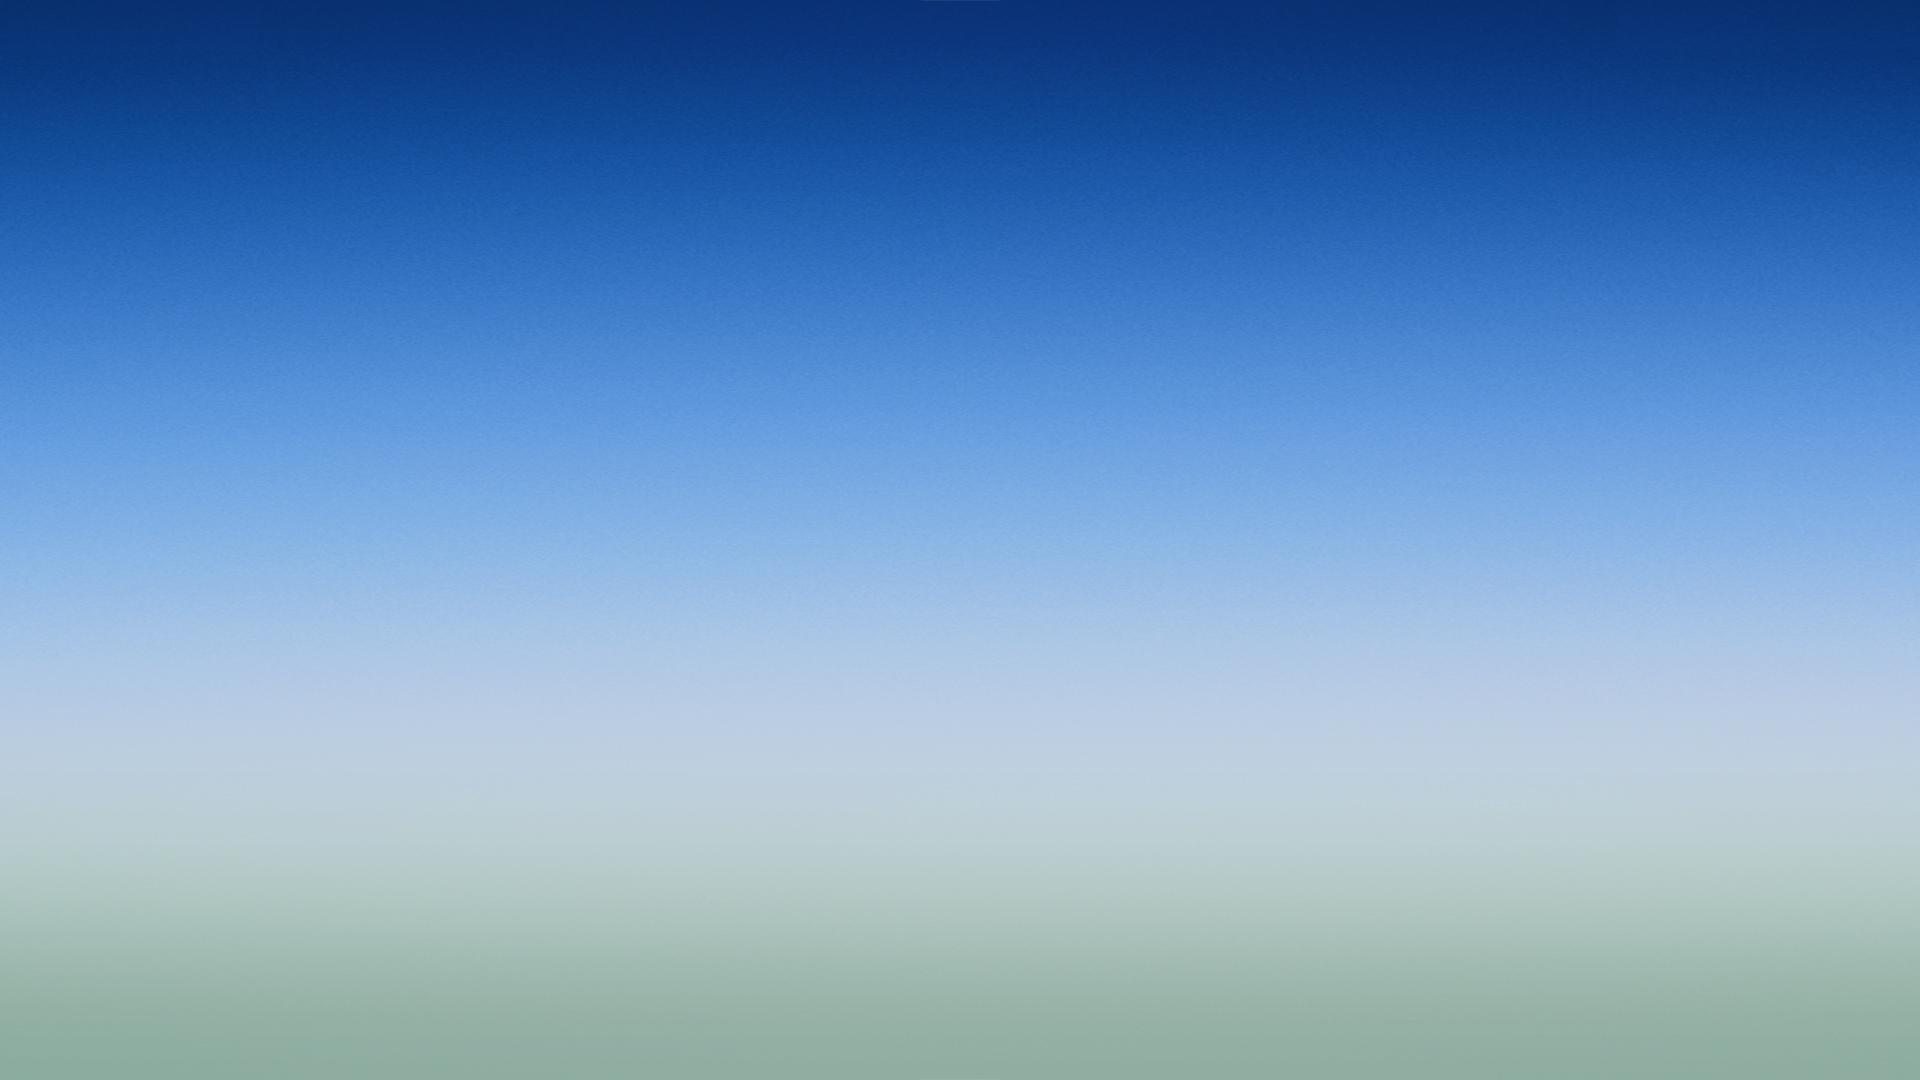 IPad Air 2 Wallpaper   Light Sun 1920x1080